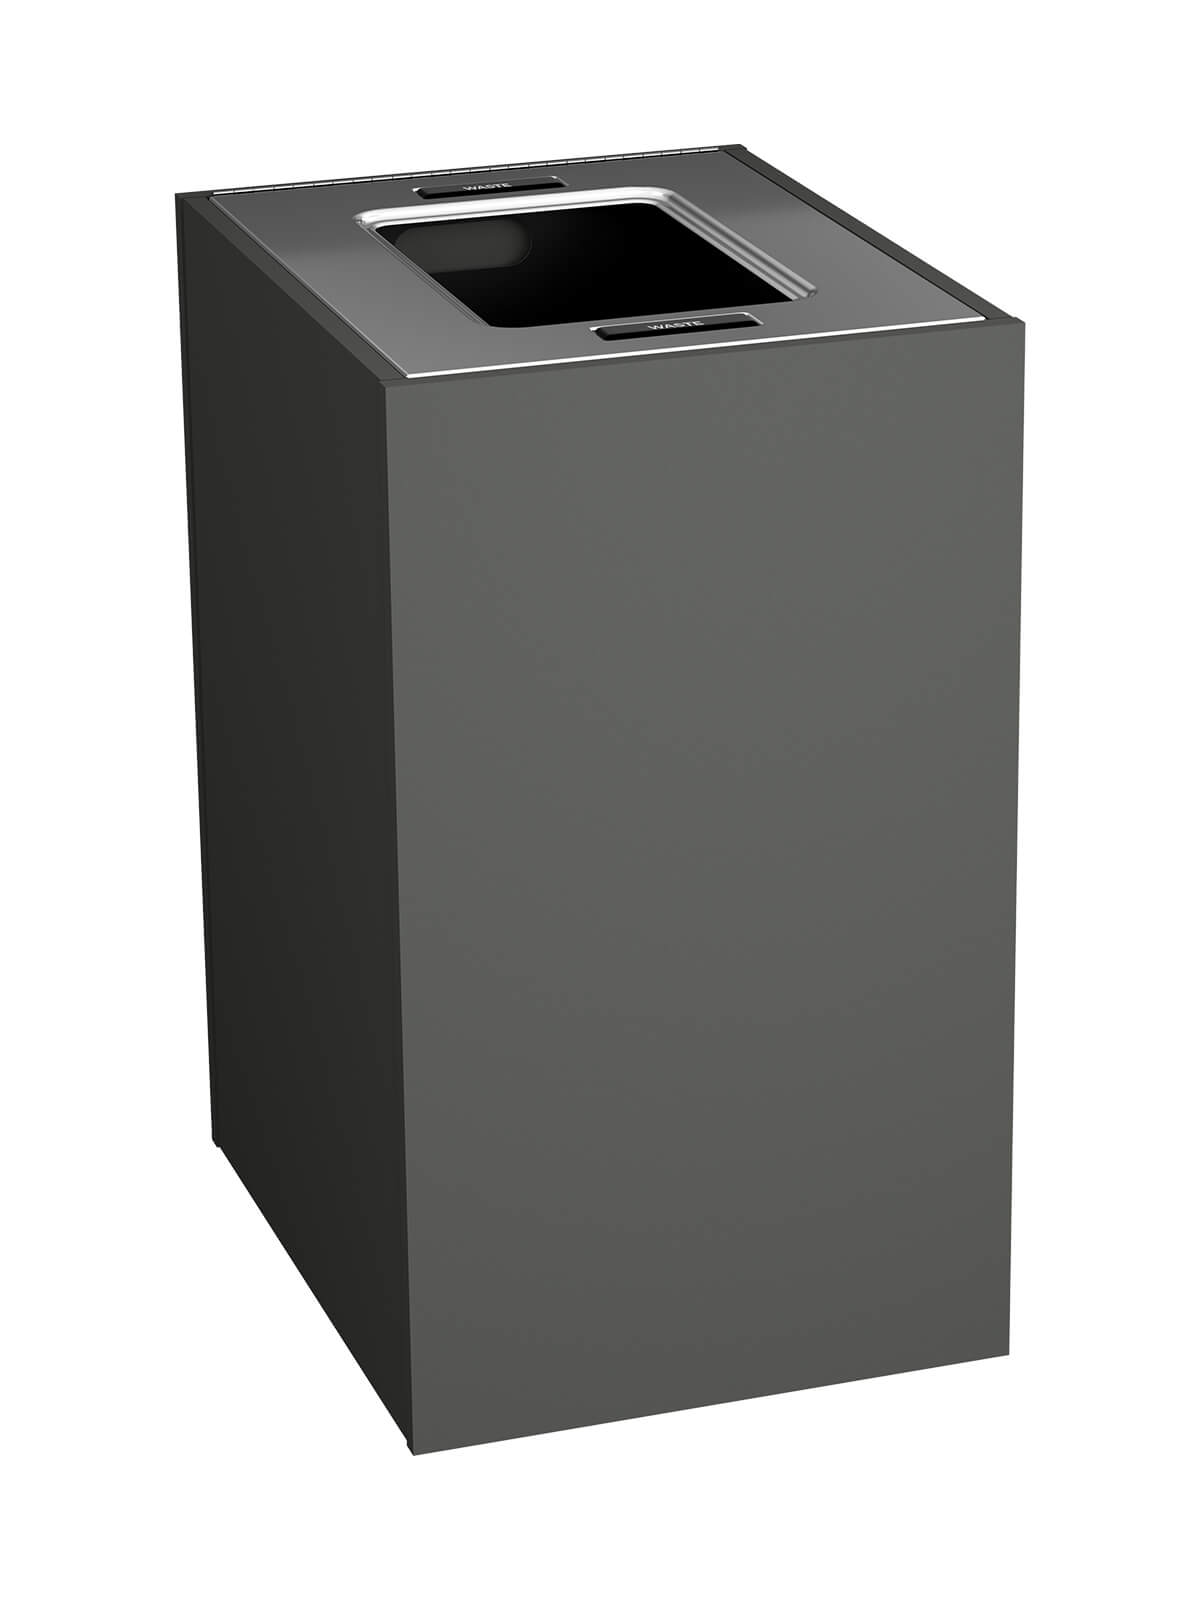 ARISTATA - Single - Xl - Waste - Full - Slate-Stainless Steel